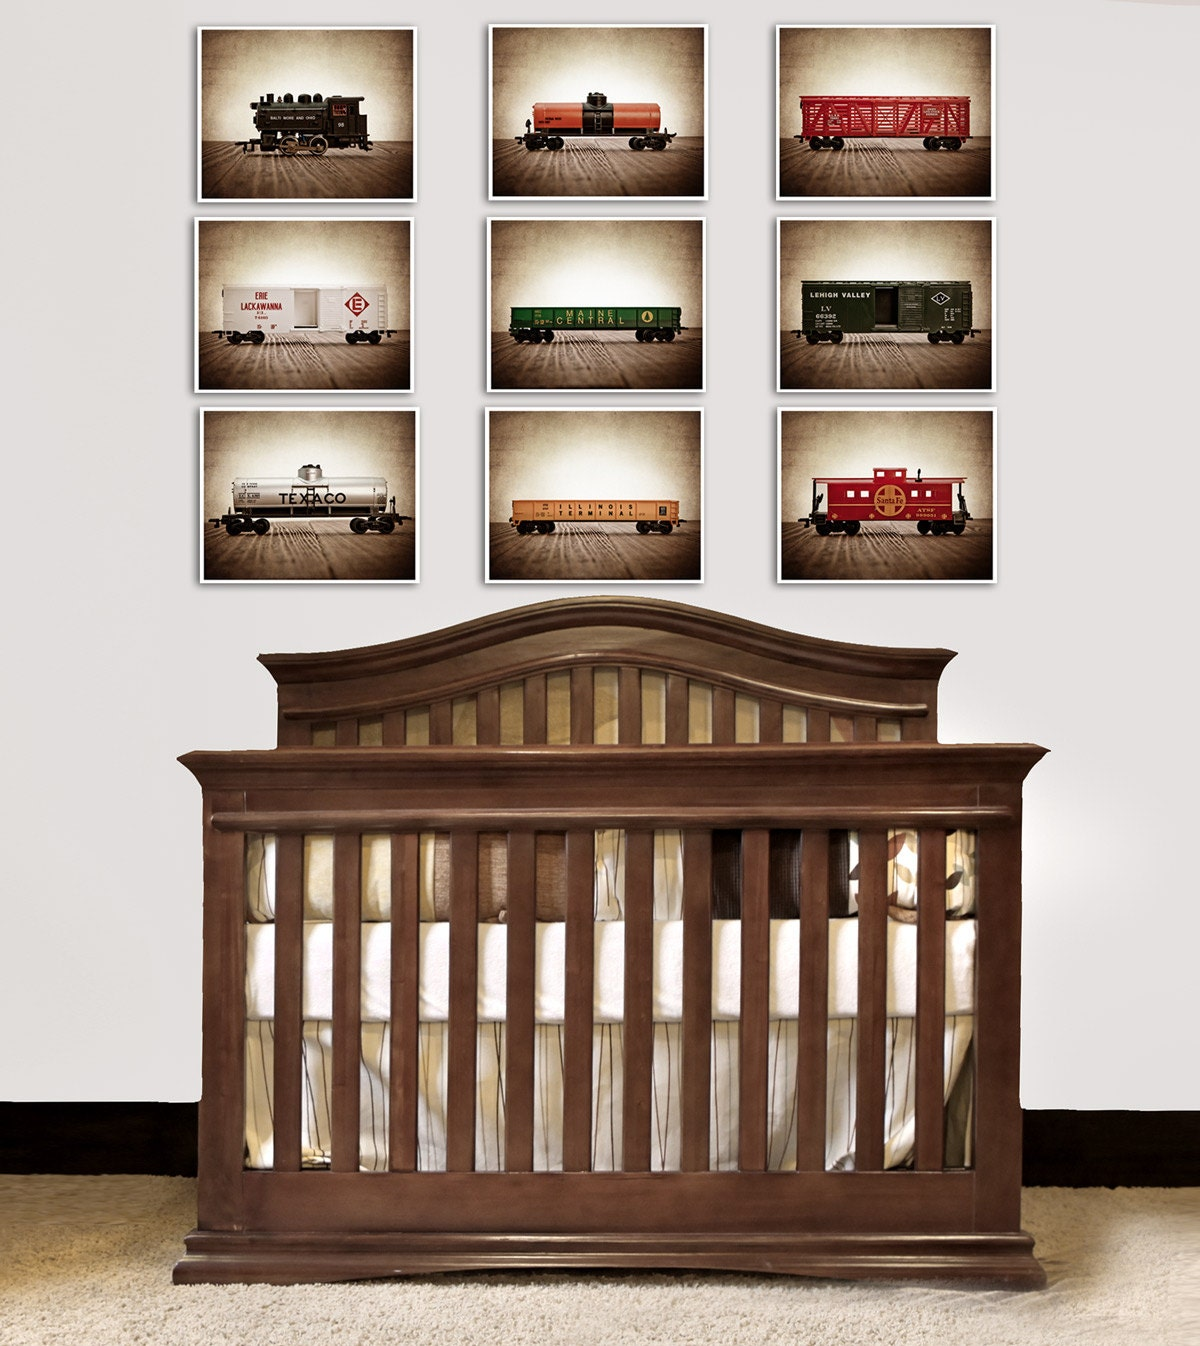 Train Decor for Boys Room, Vintage Toy Trains set of Nine Photo Prints, Boys Nursery Decor, Rustic Decor Toy Trains, Baby room ideas